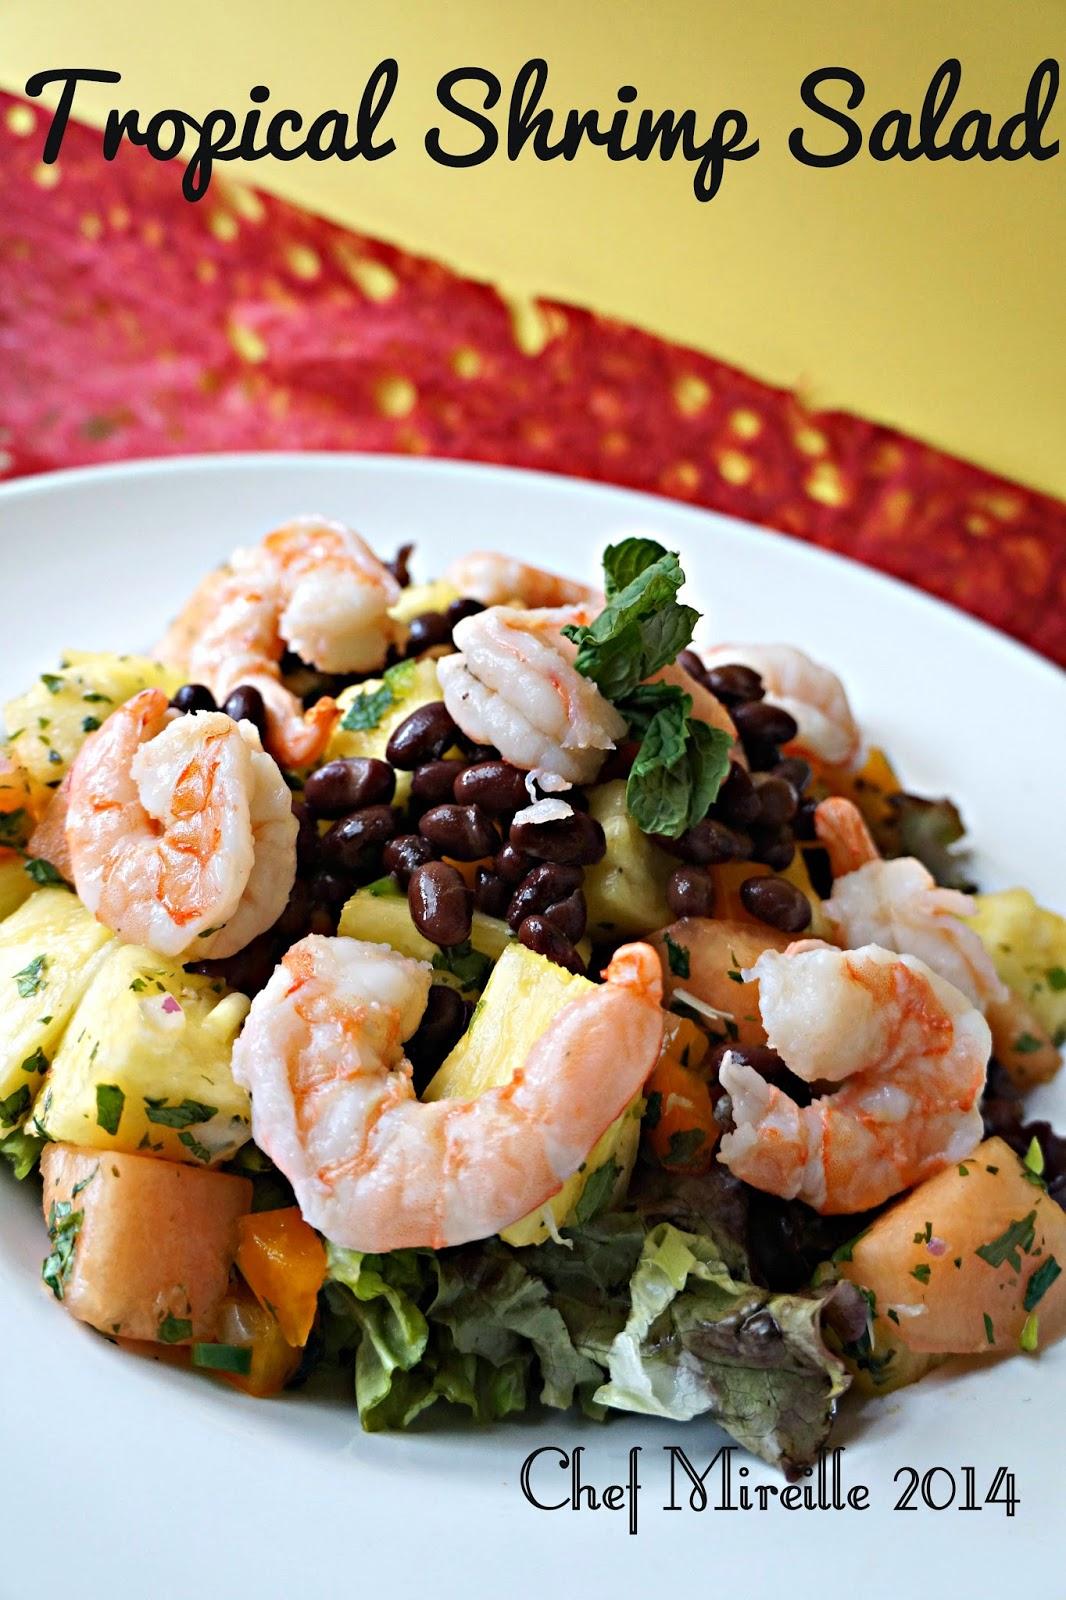 Shrimp Salad Recipe Like Costco